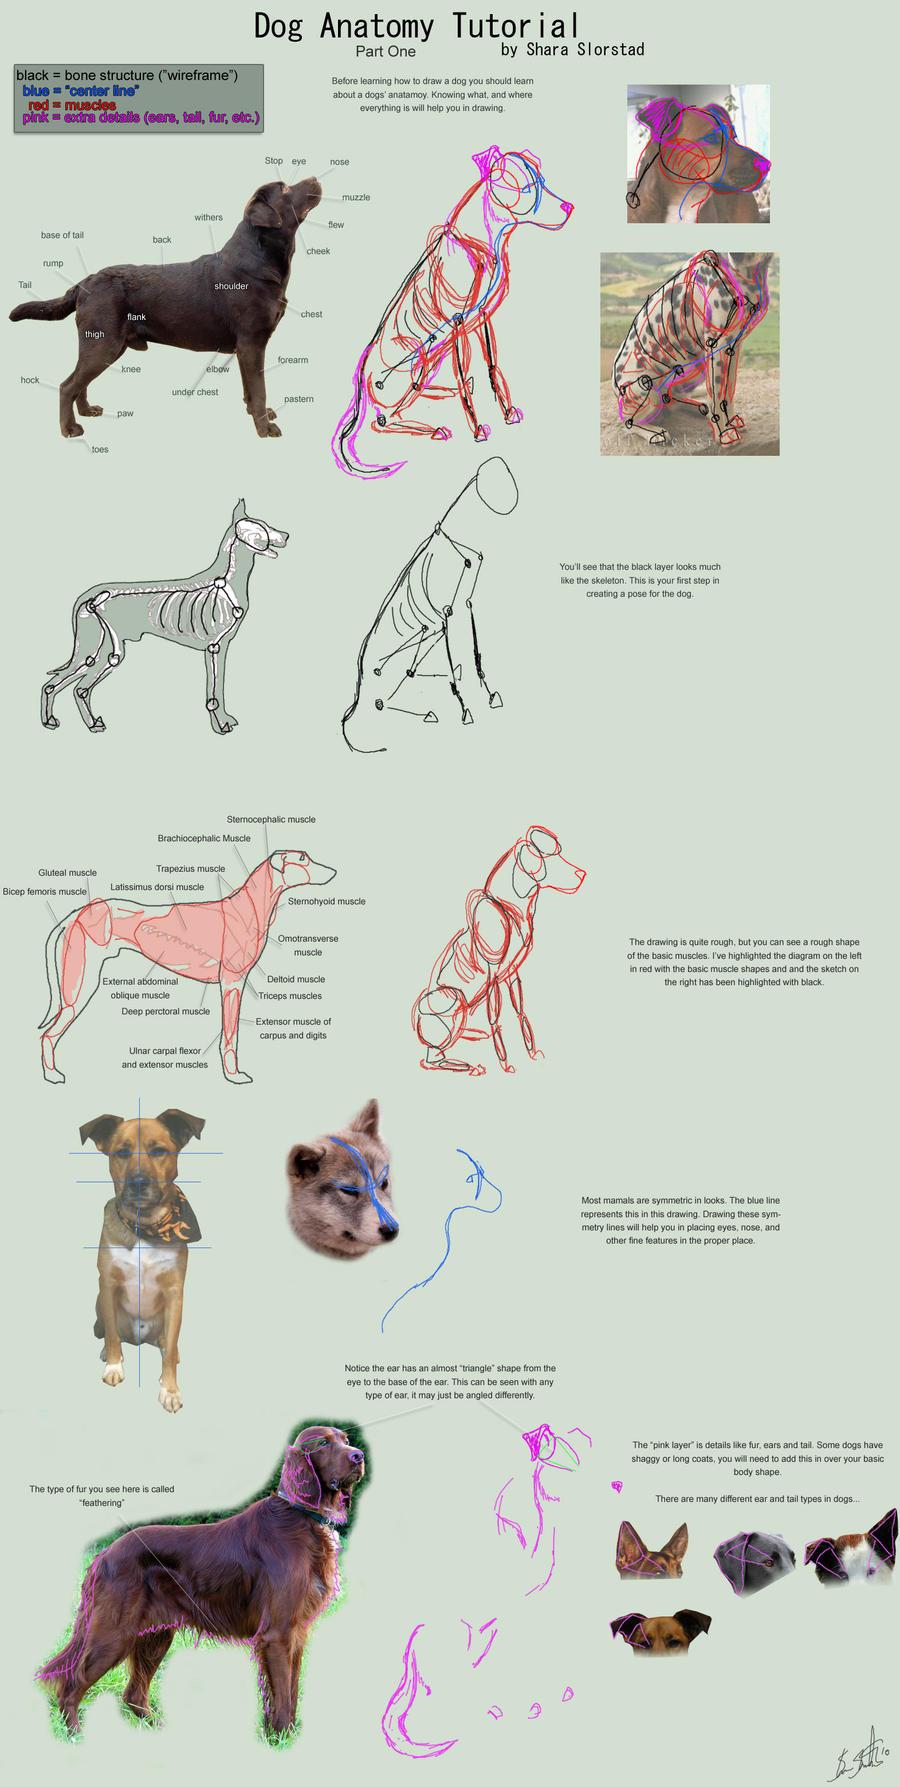 Dog Anatomy Tutorial 1 by SleepingDeadGirl on DeviantArt